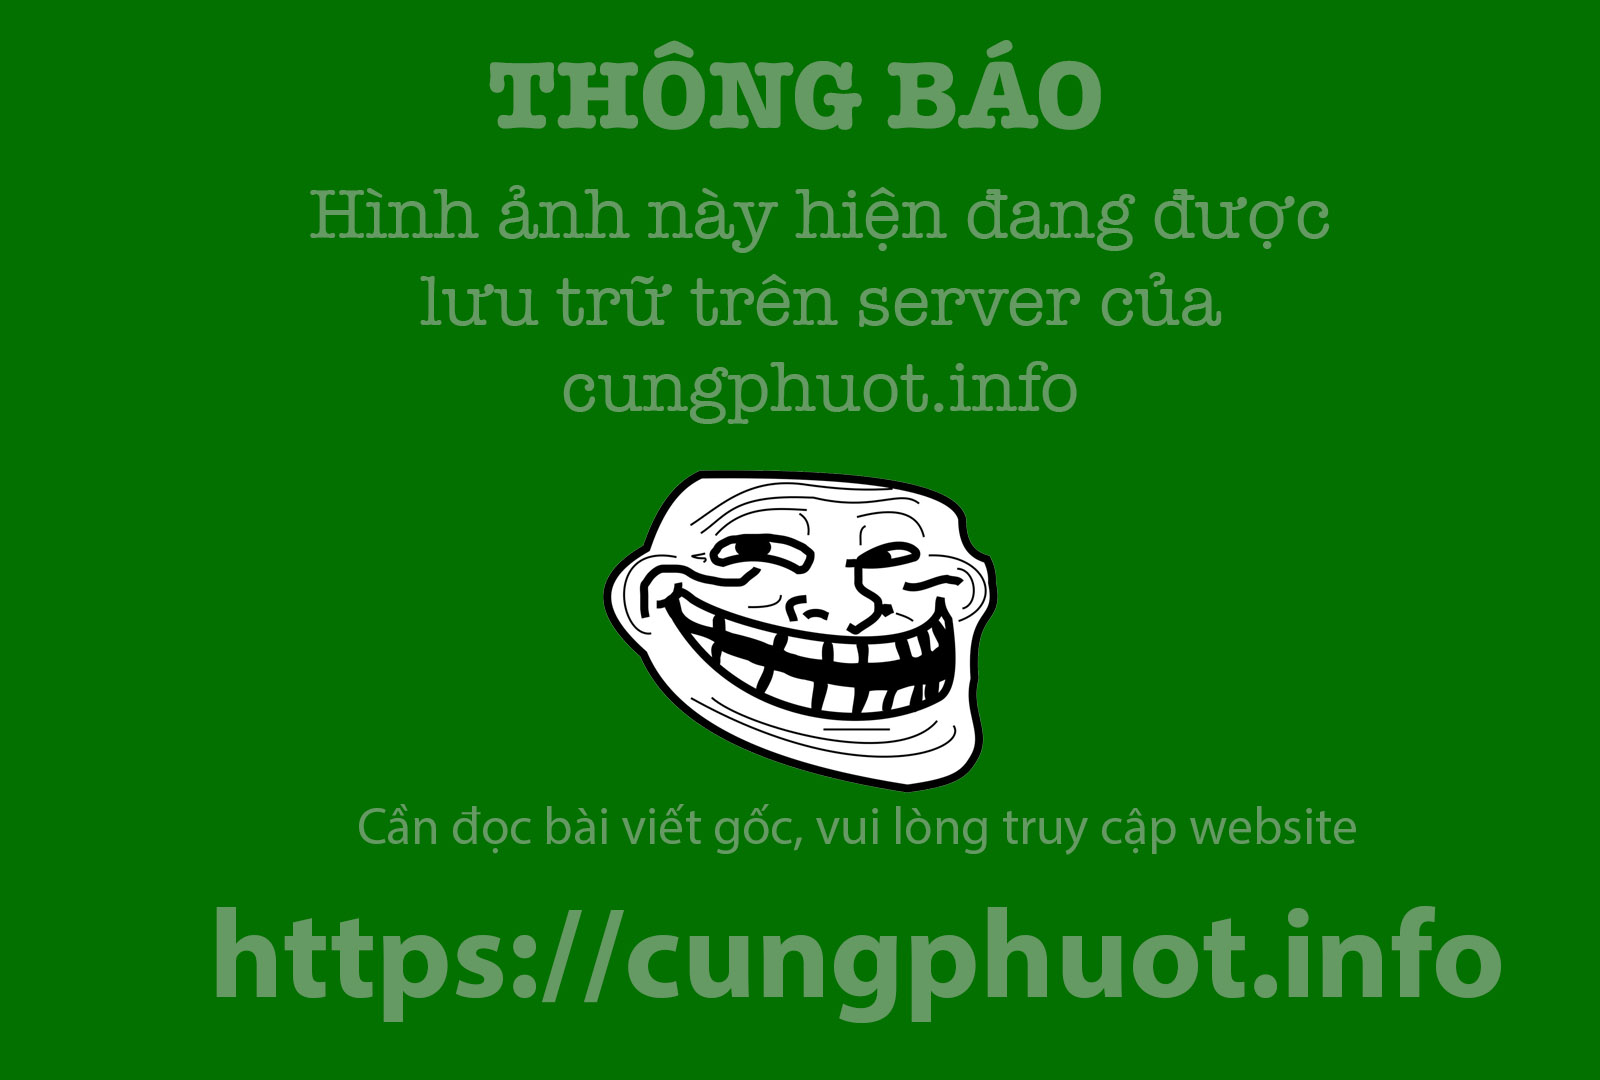 Vuon hoa tam giac mach o Ninh Binh hinh anh 5